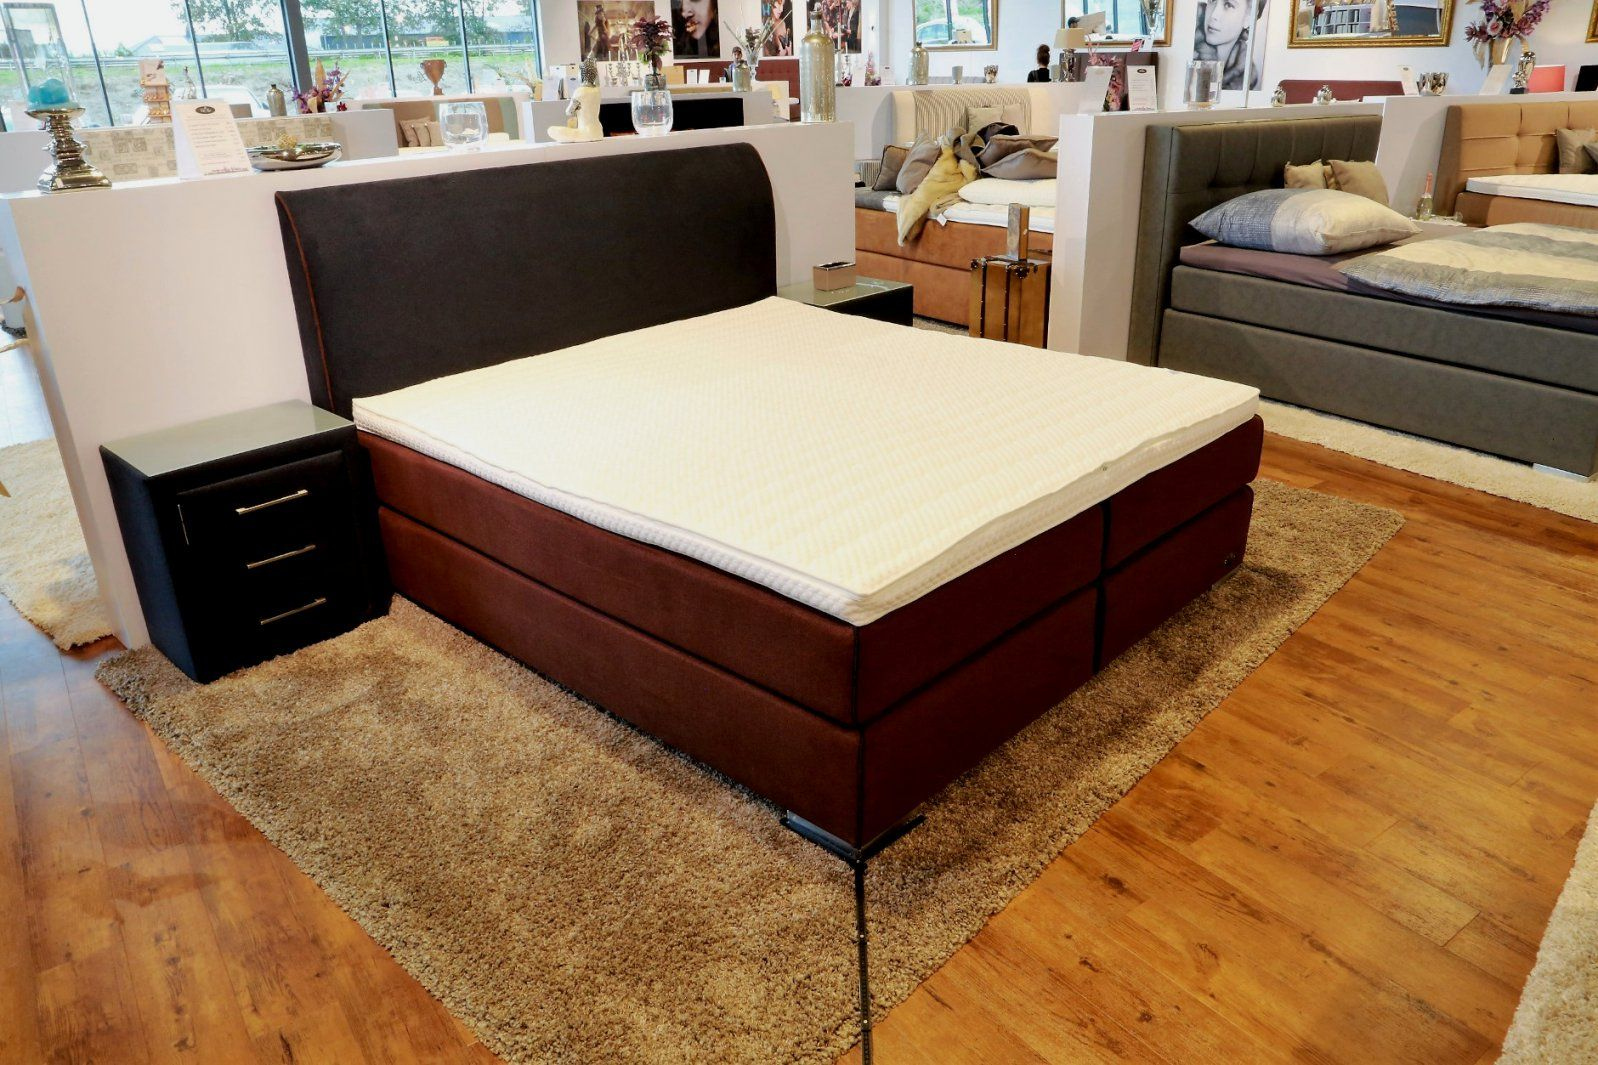 boxspringbetten lagerverkauf d sseldorf haus design ideen. Black Bedroom Furniture Sets. Home Design Ideas